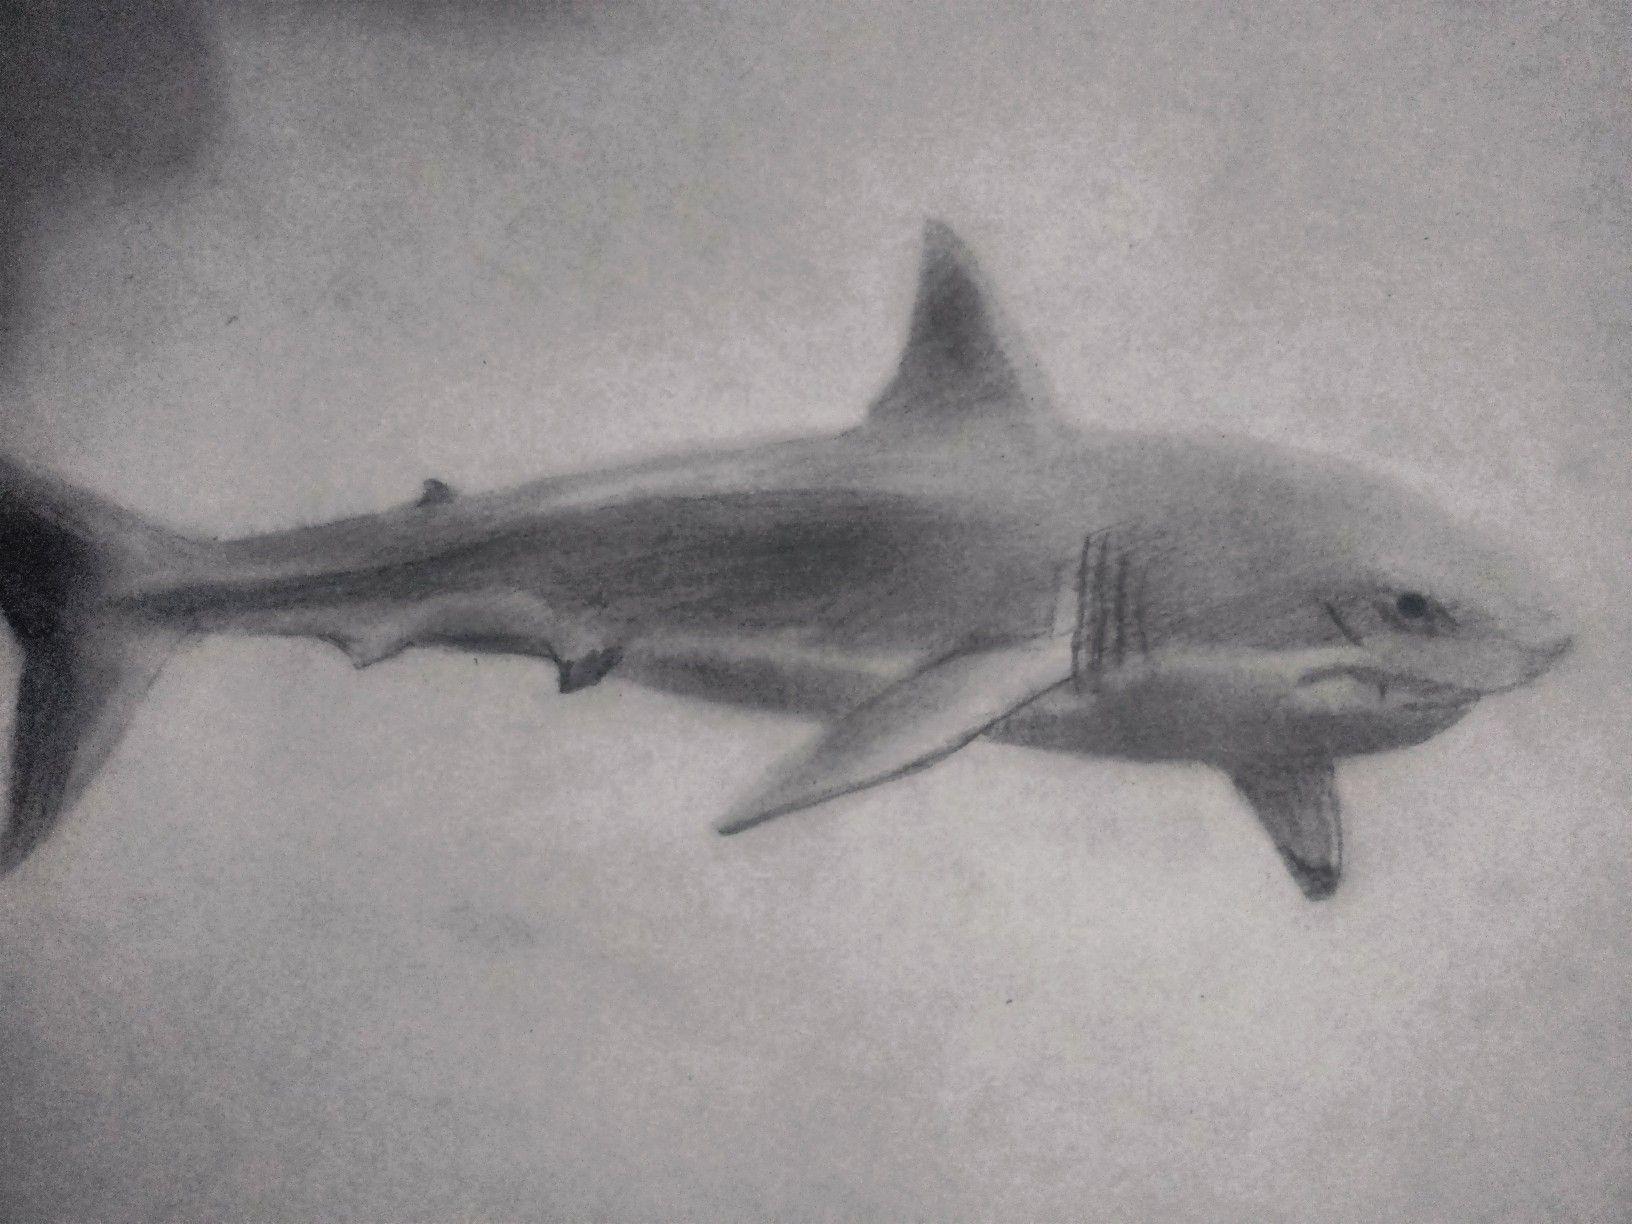 Dibujos De Tiburones Realistas